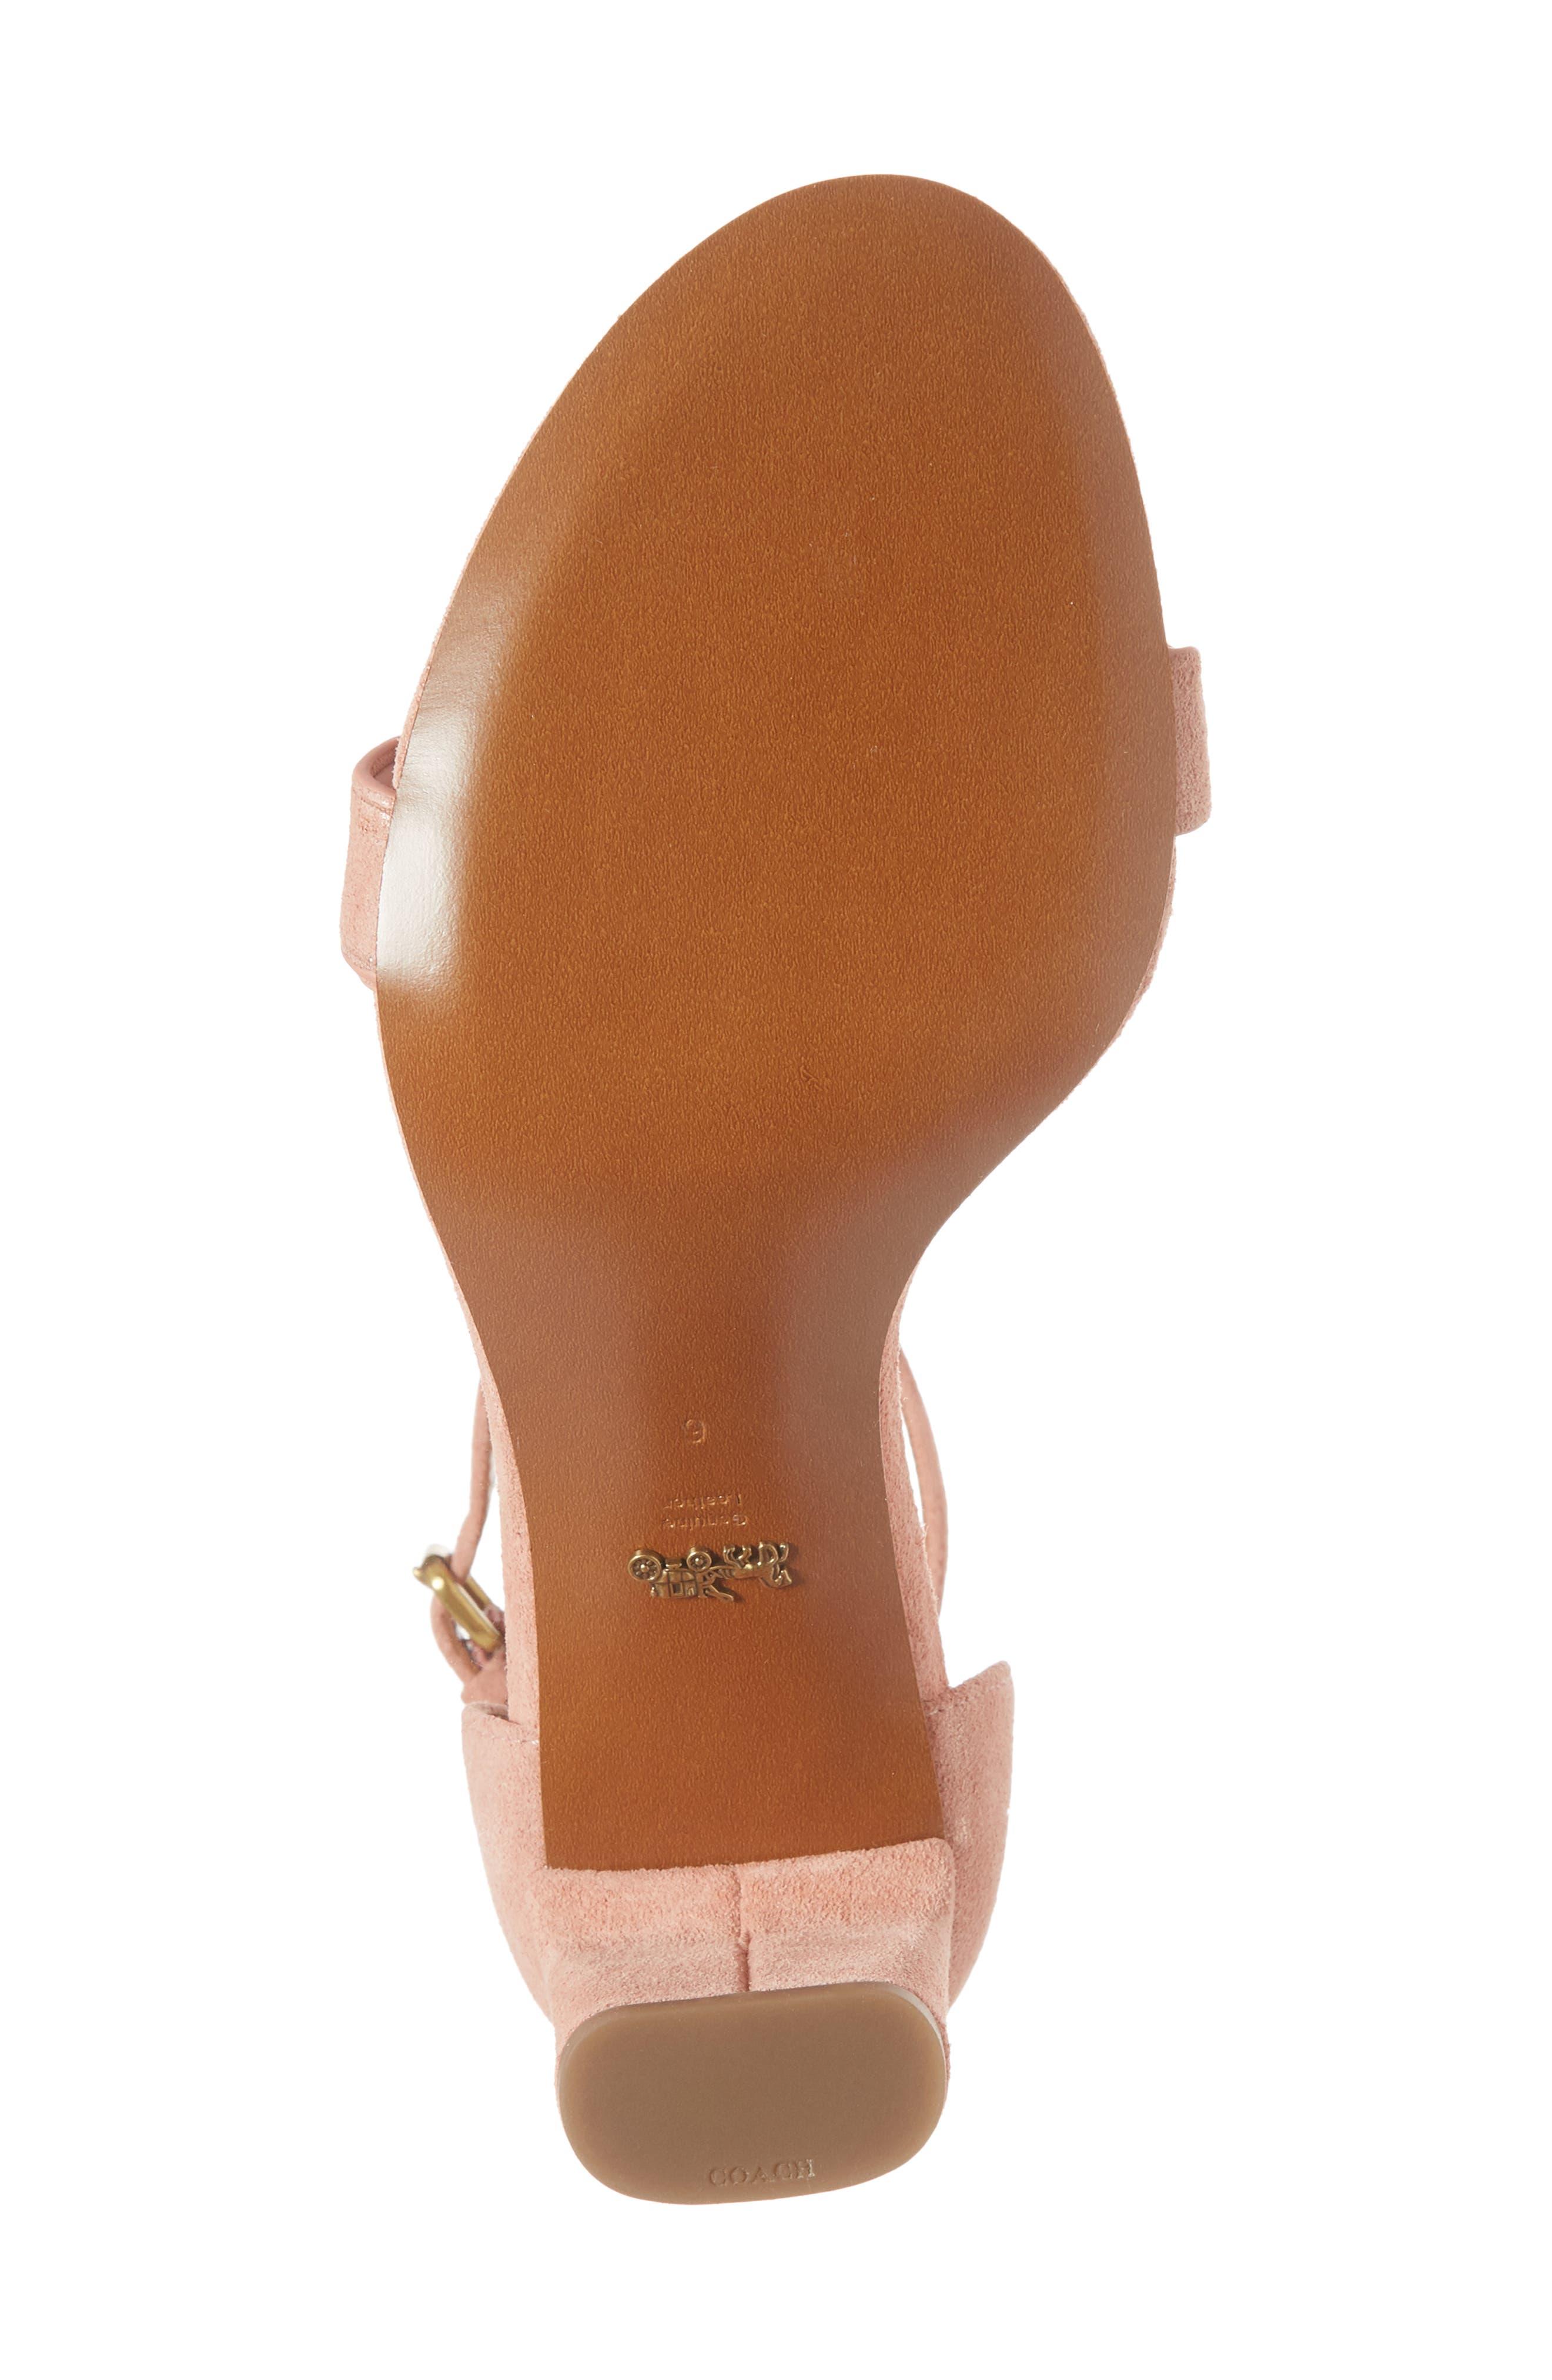 Link Strap Sandal,                             Alternate thumbnail 7, color,                             Peony Leather